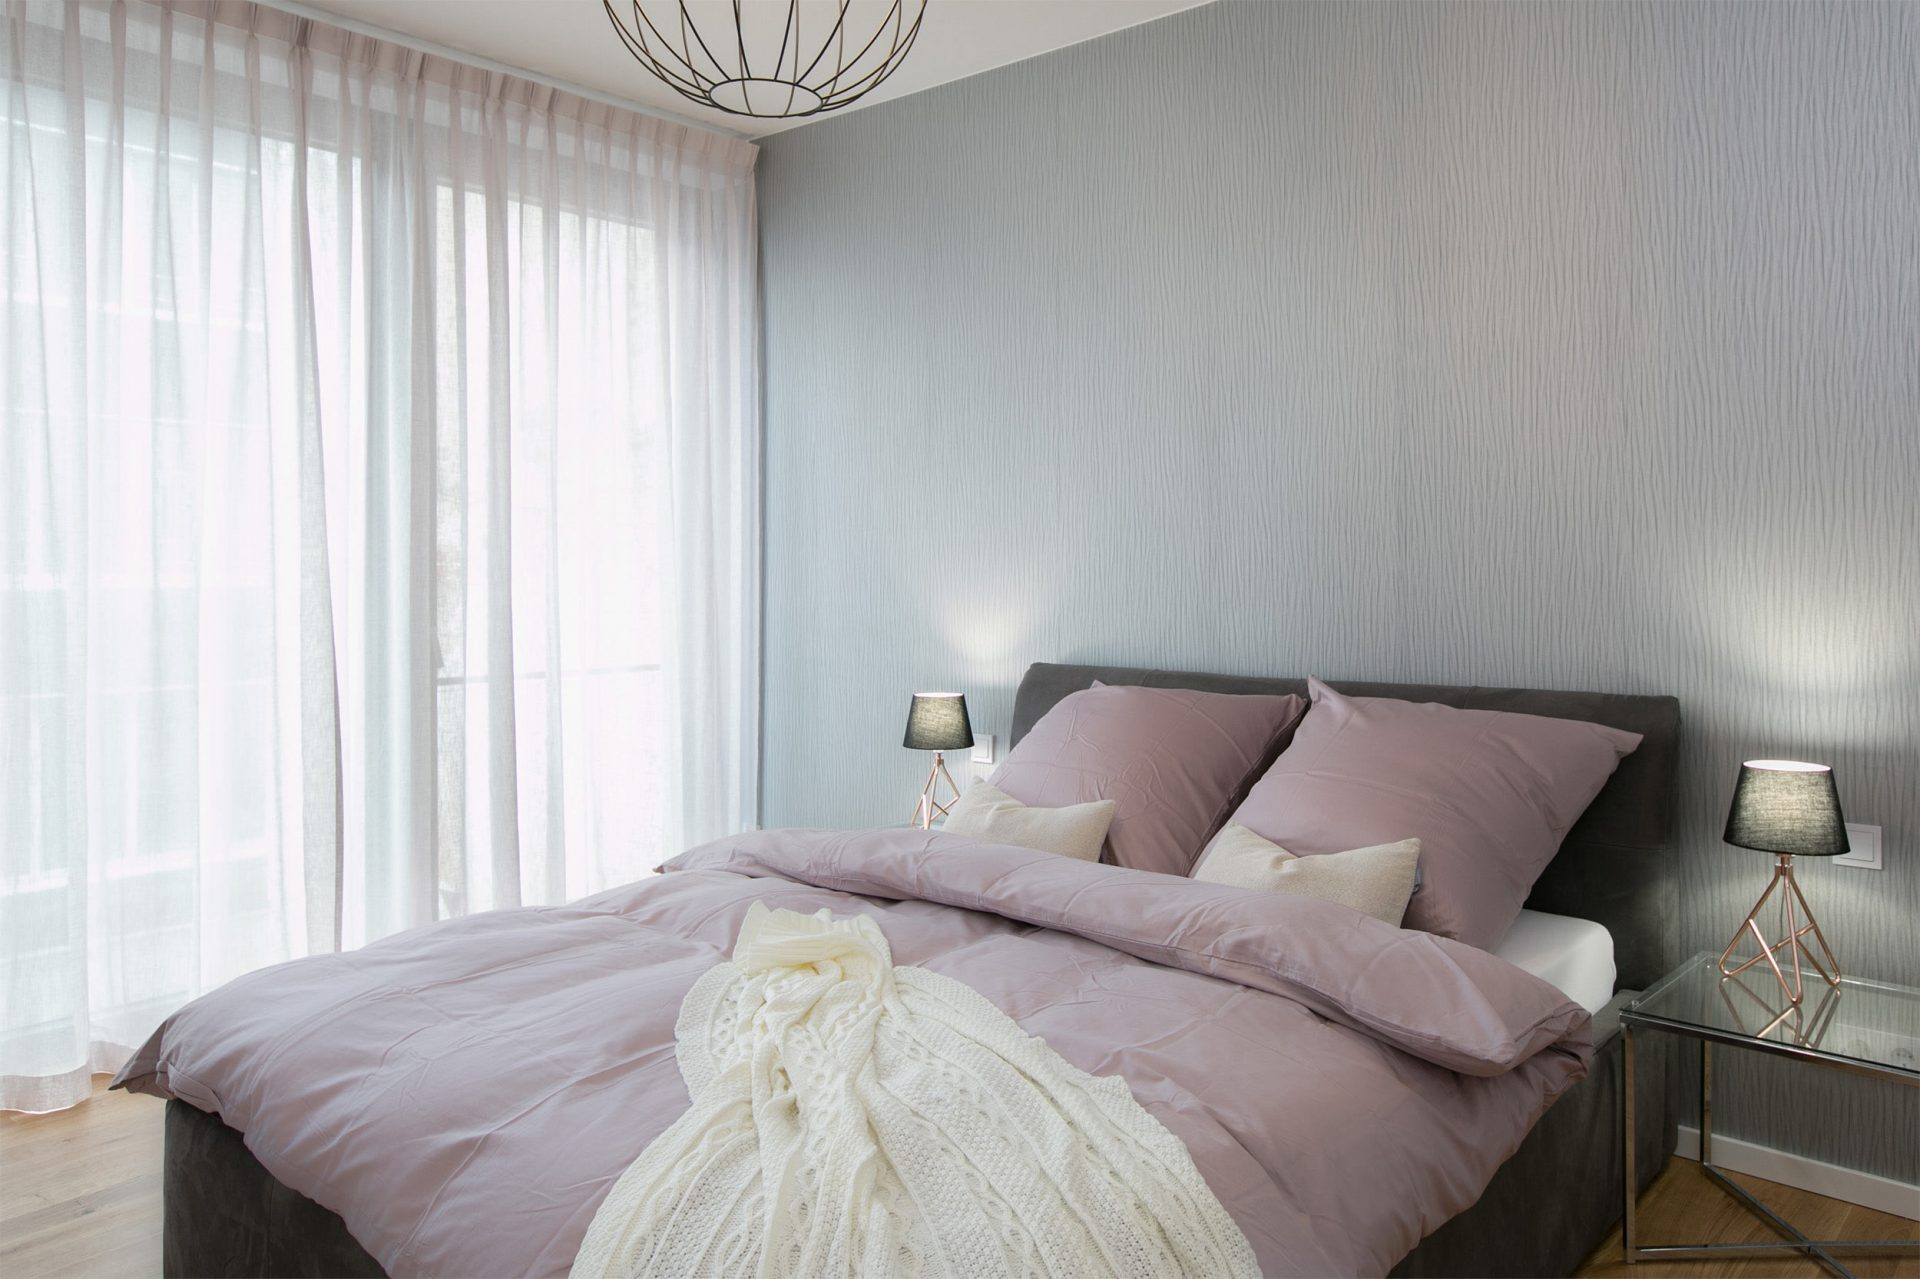 Immobilienfotografie Schlafzimmer ©offenblende.de